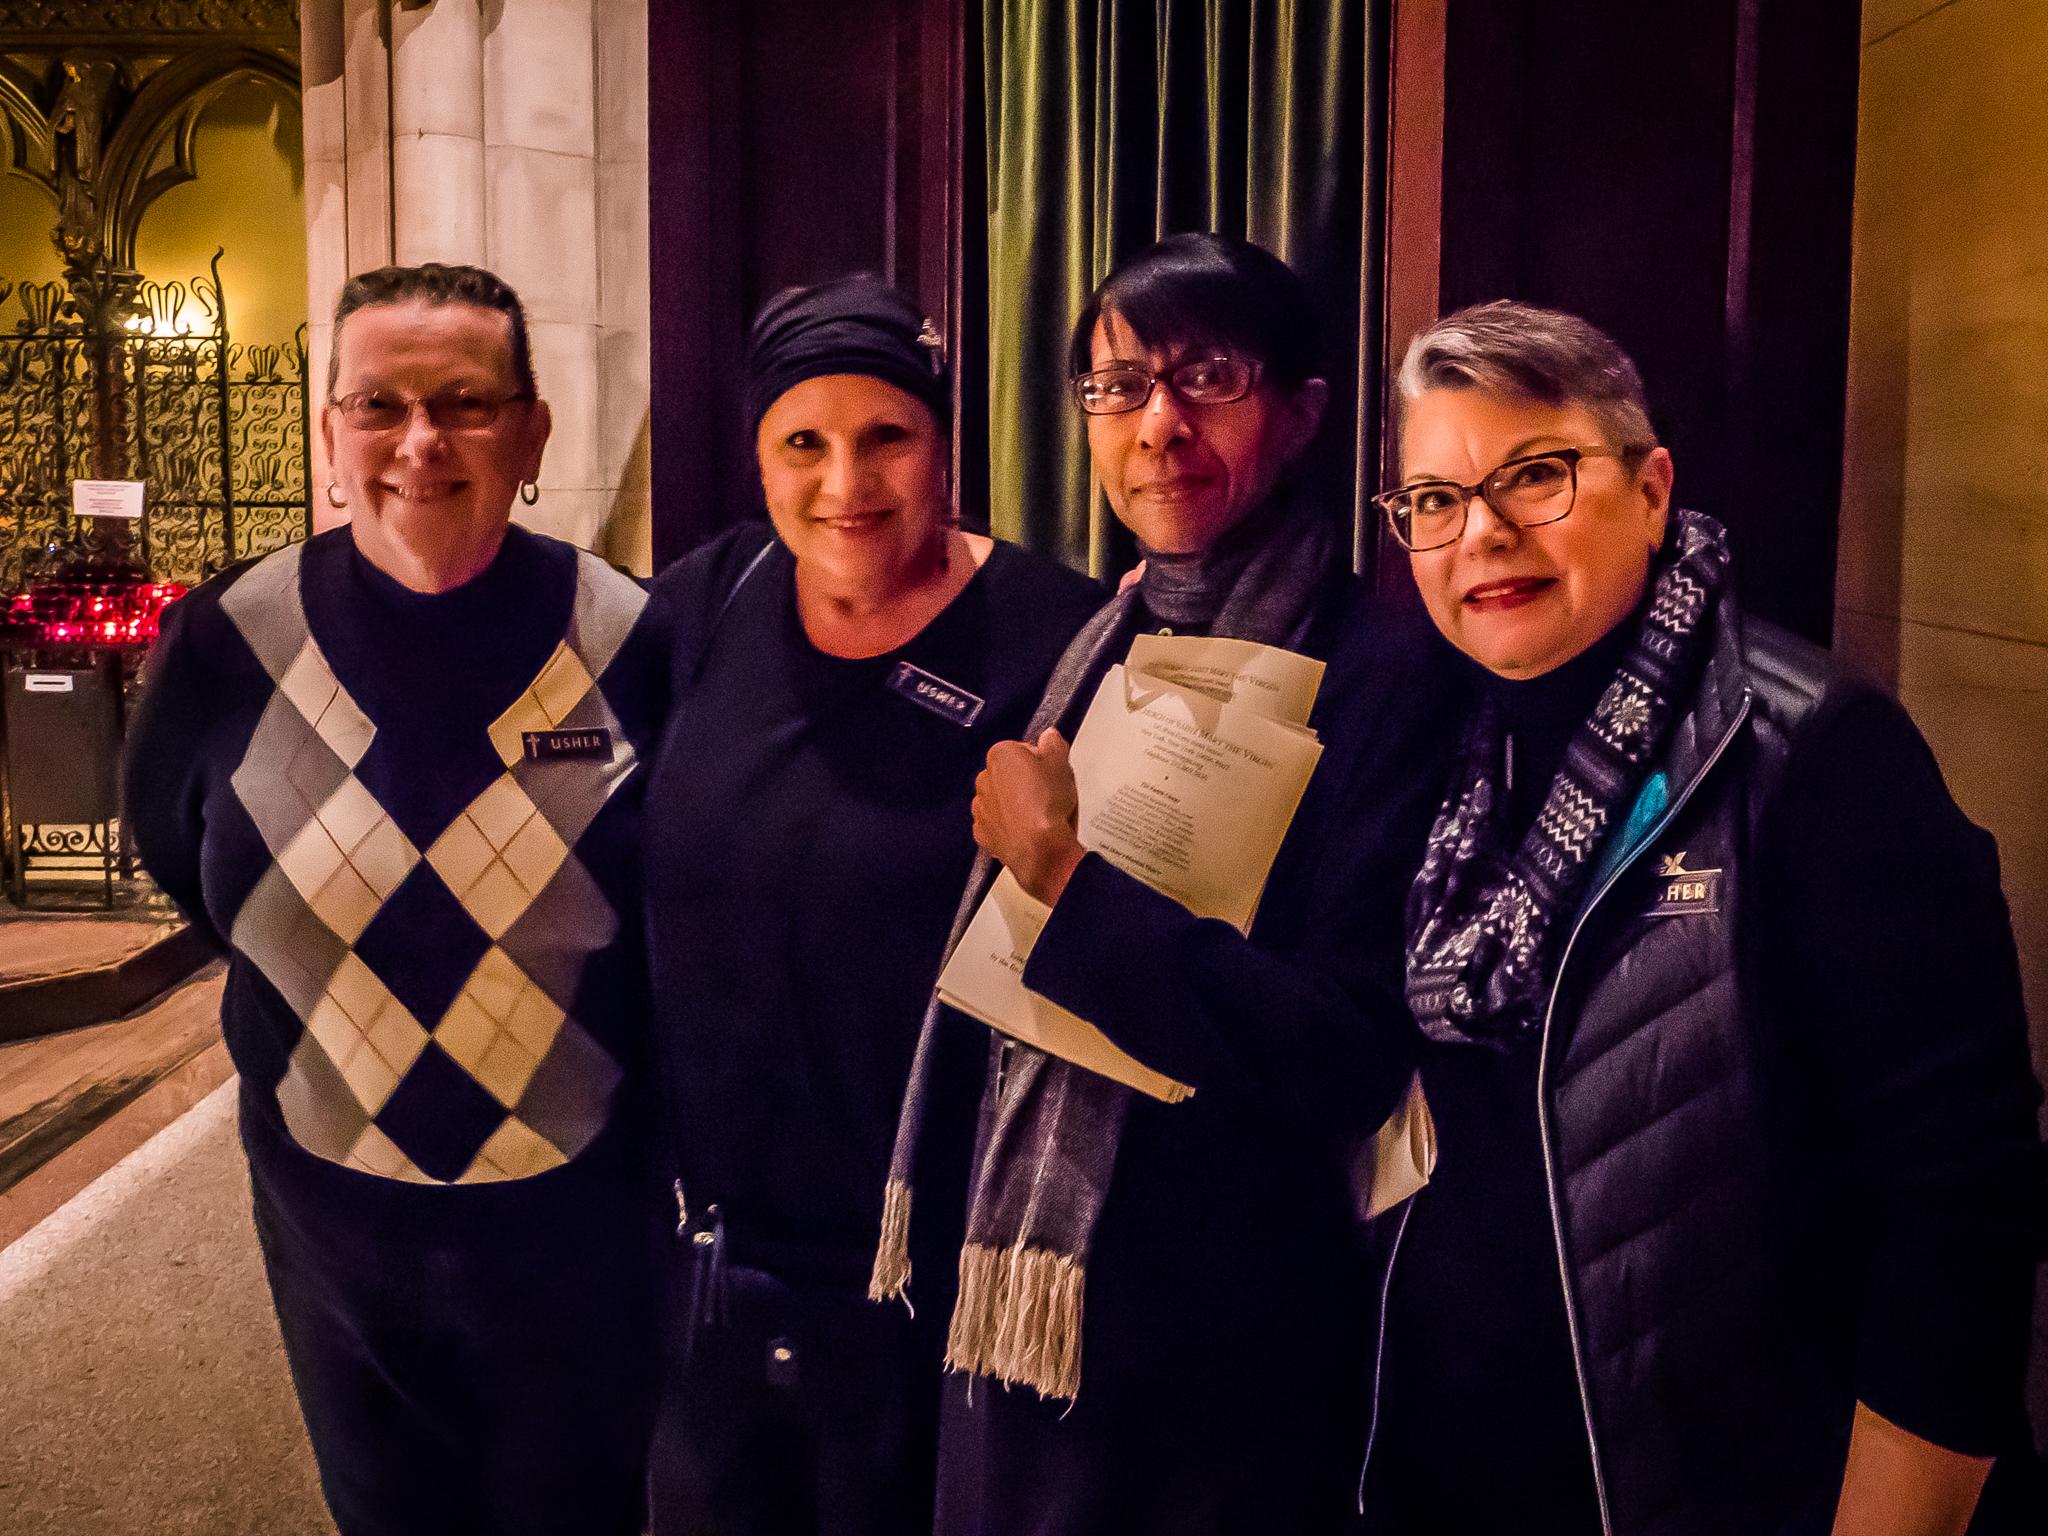 Usher Team (l. to r.): Pat Rheinhold, Eloise Hoffman, Sharon Stewart & Mary Robison  Photo by Ricardo Gomez